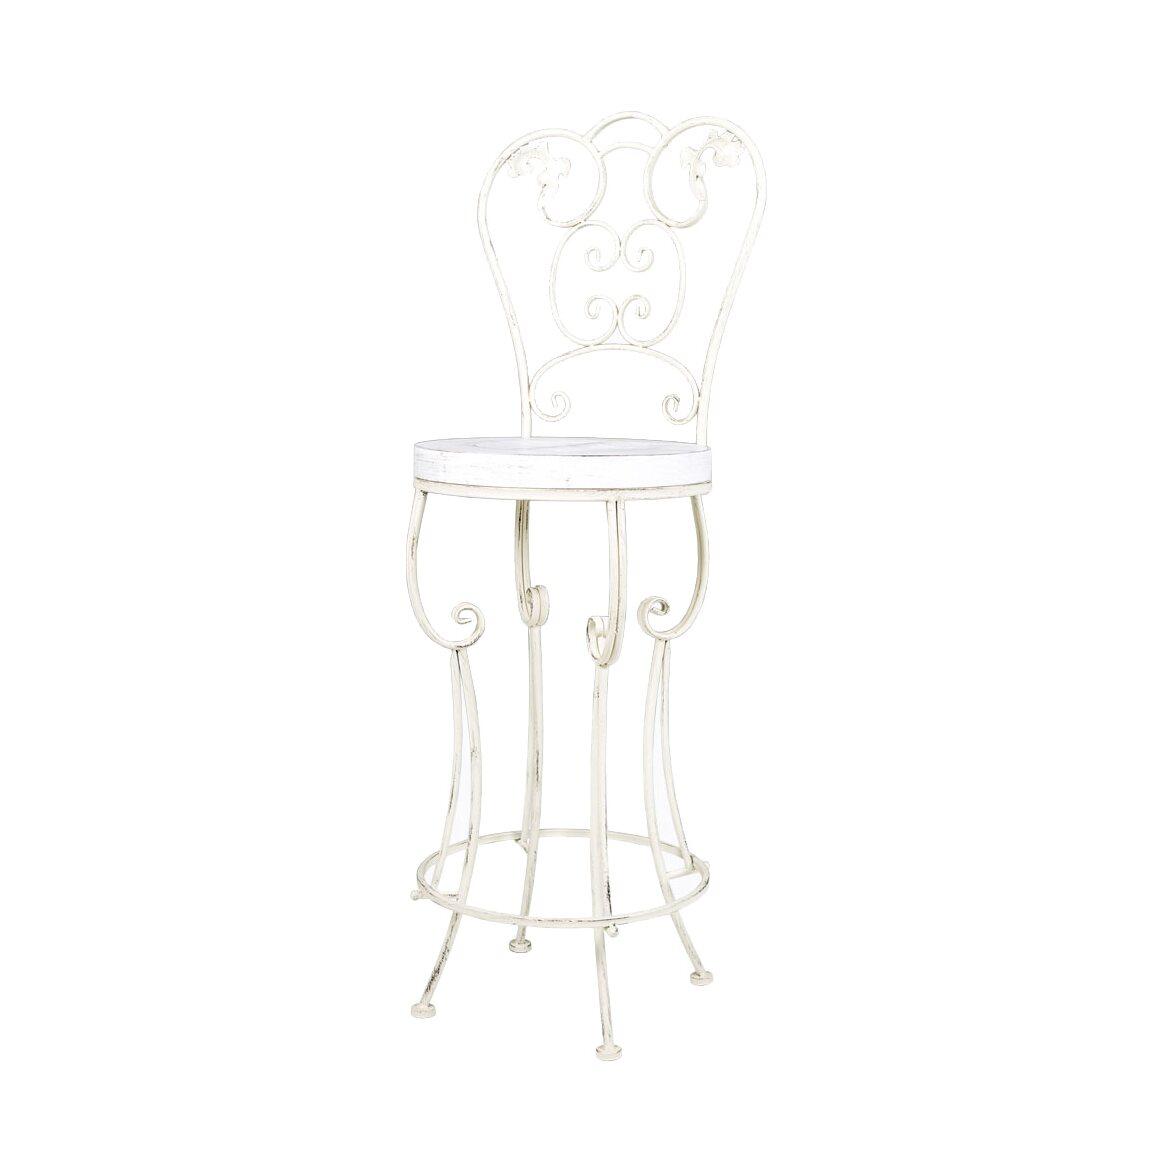 Барный стул «Болеро» (белый антик) | Барные стулья Kingsby